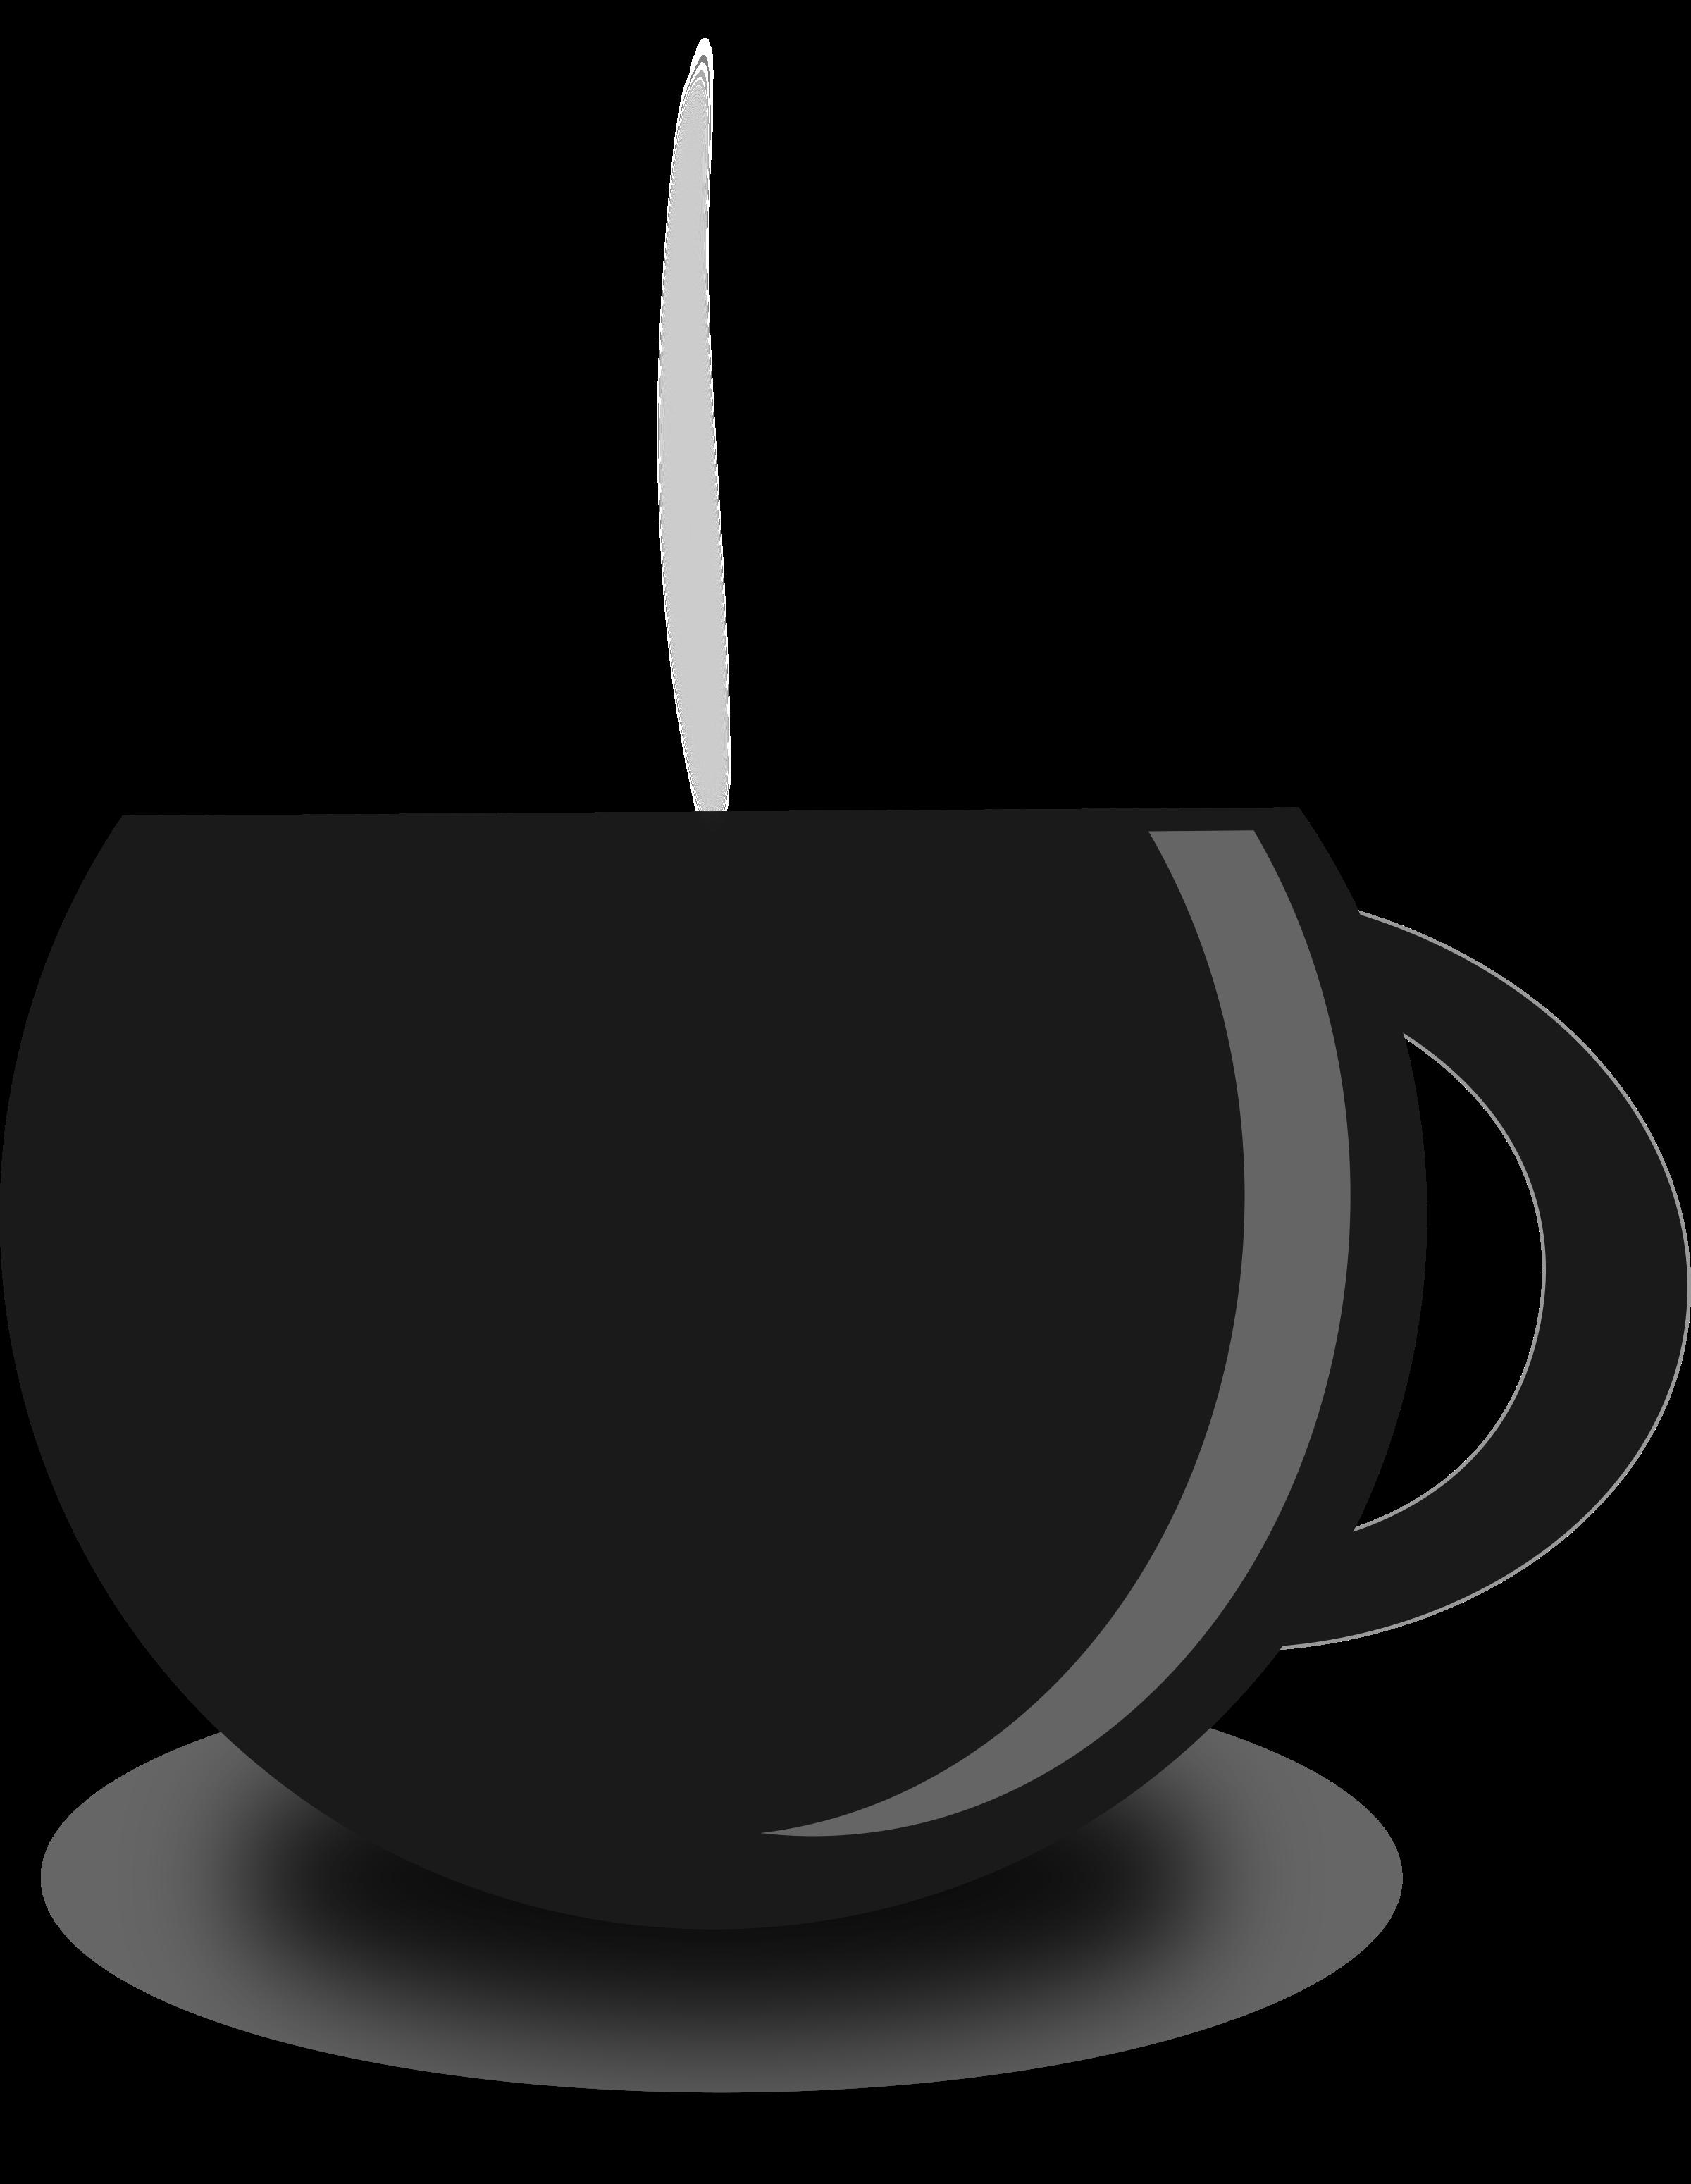 2400x3099 Fancy Tea Cup Silhouette Clipart